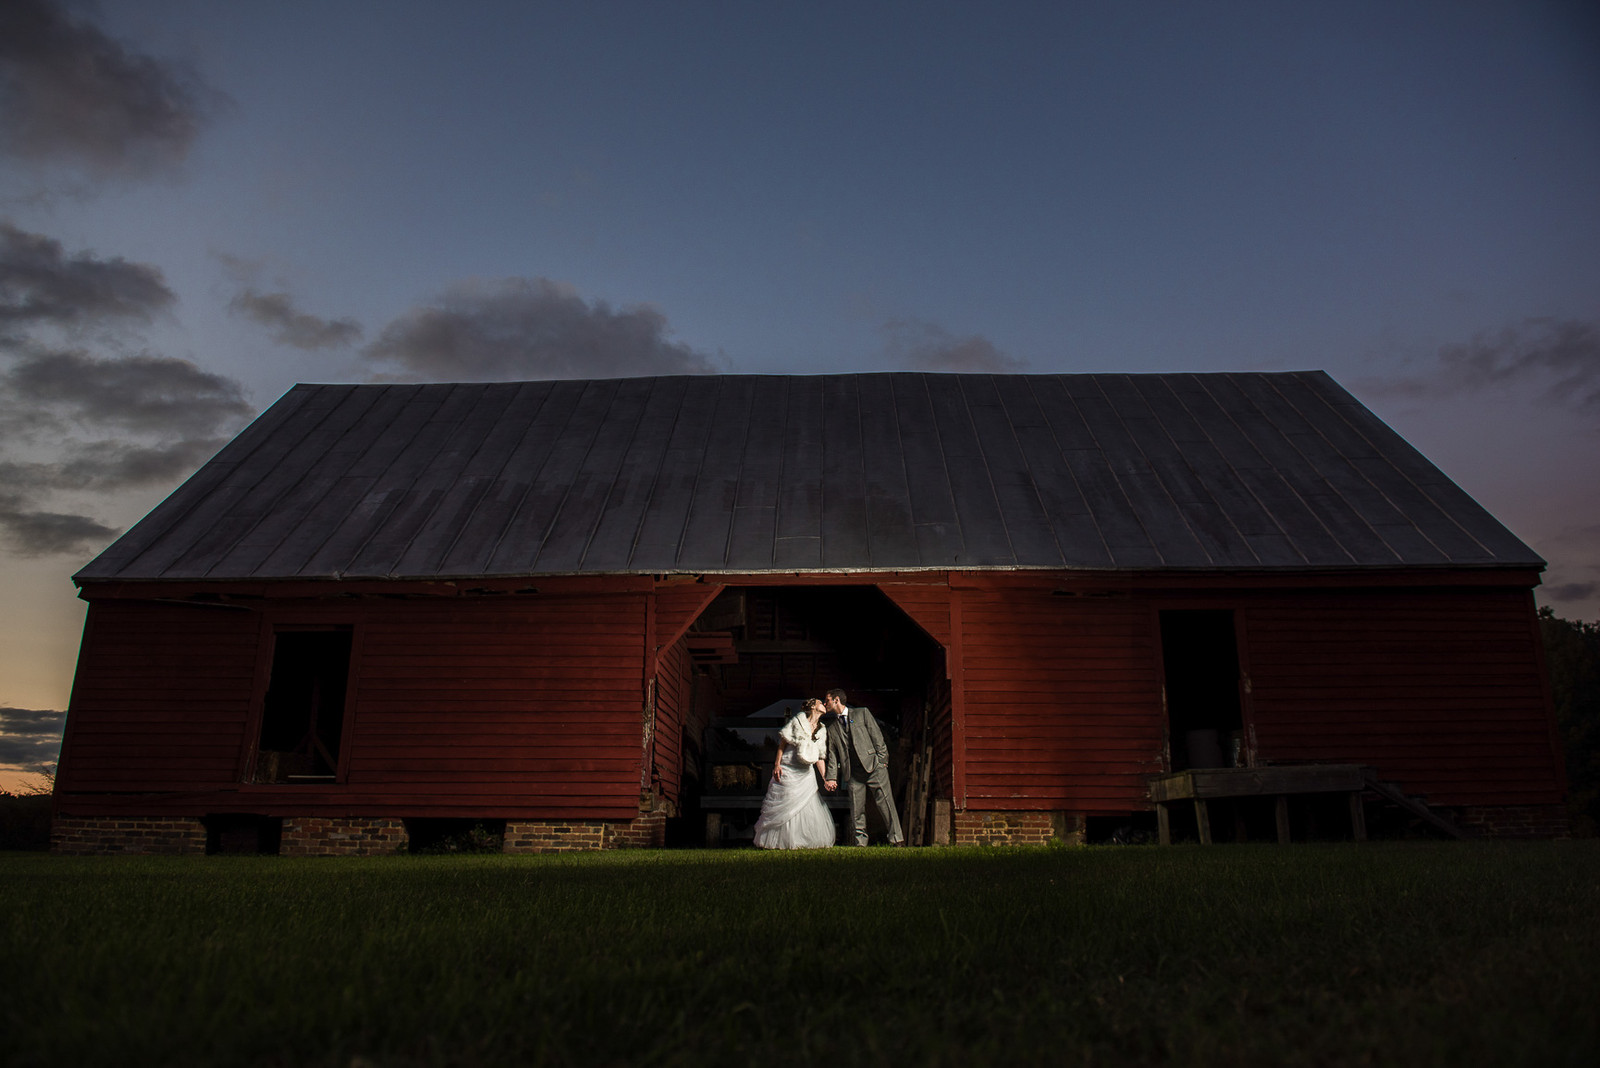 Belle Isle State Park Wedding Photography Photographer In Richmond Va Marek K Home